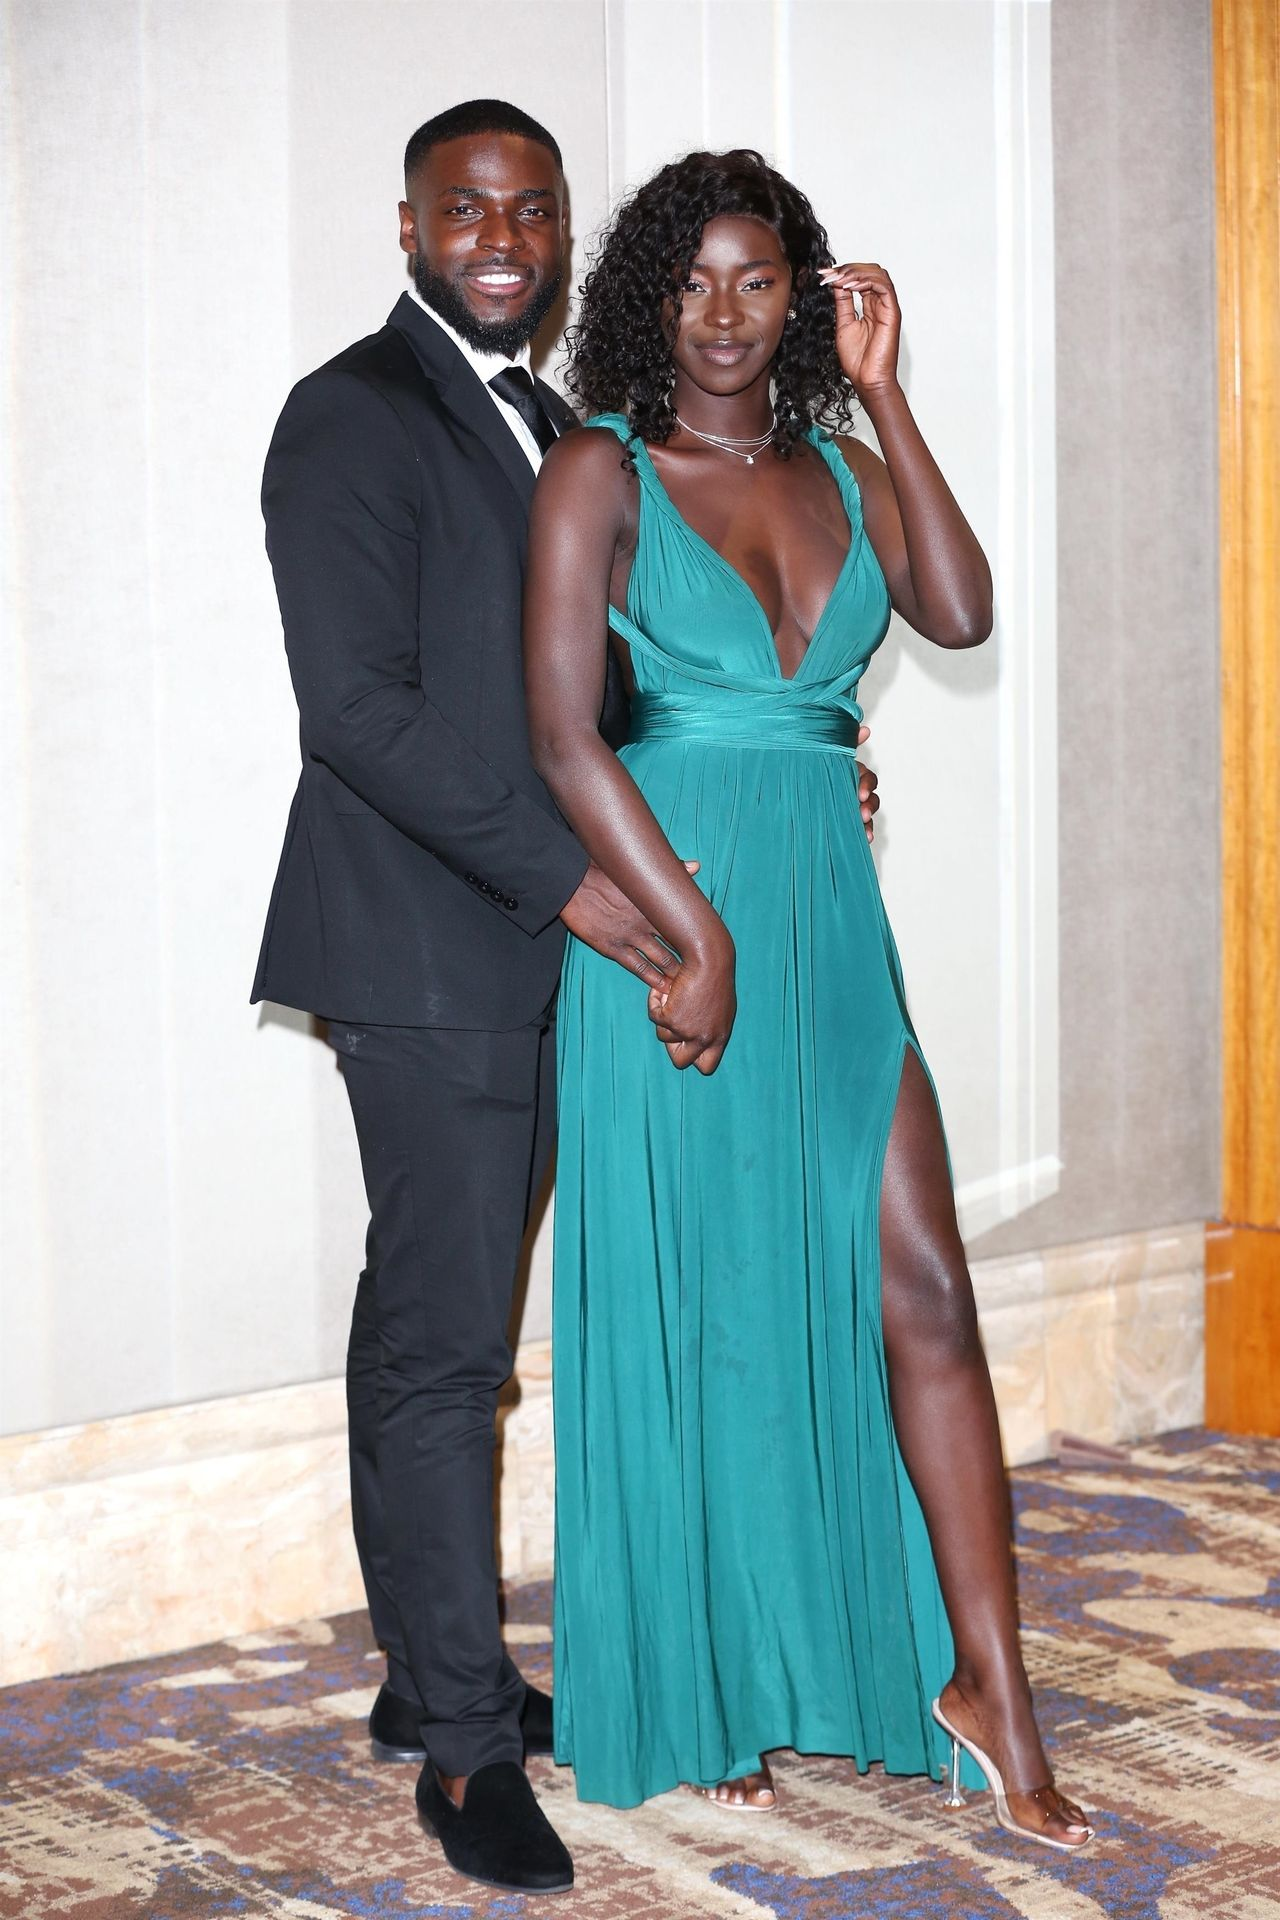 Mike Boateng & Priscilla Anyabu Are Seen At British Ethnic Diversity Sports Awards 0130